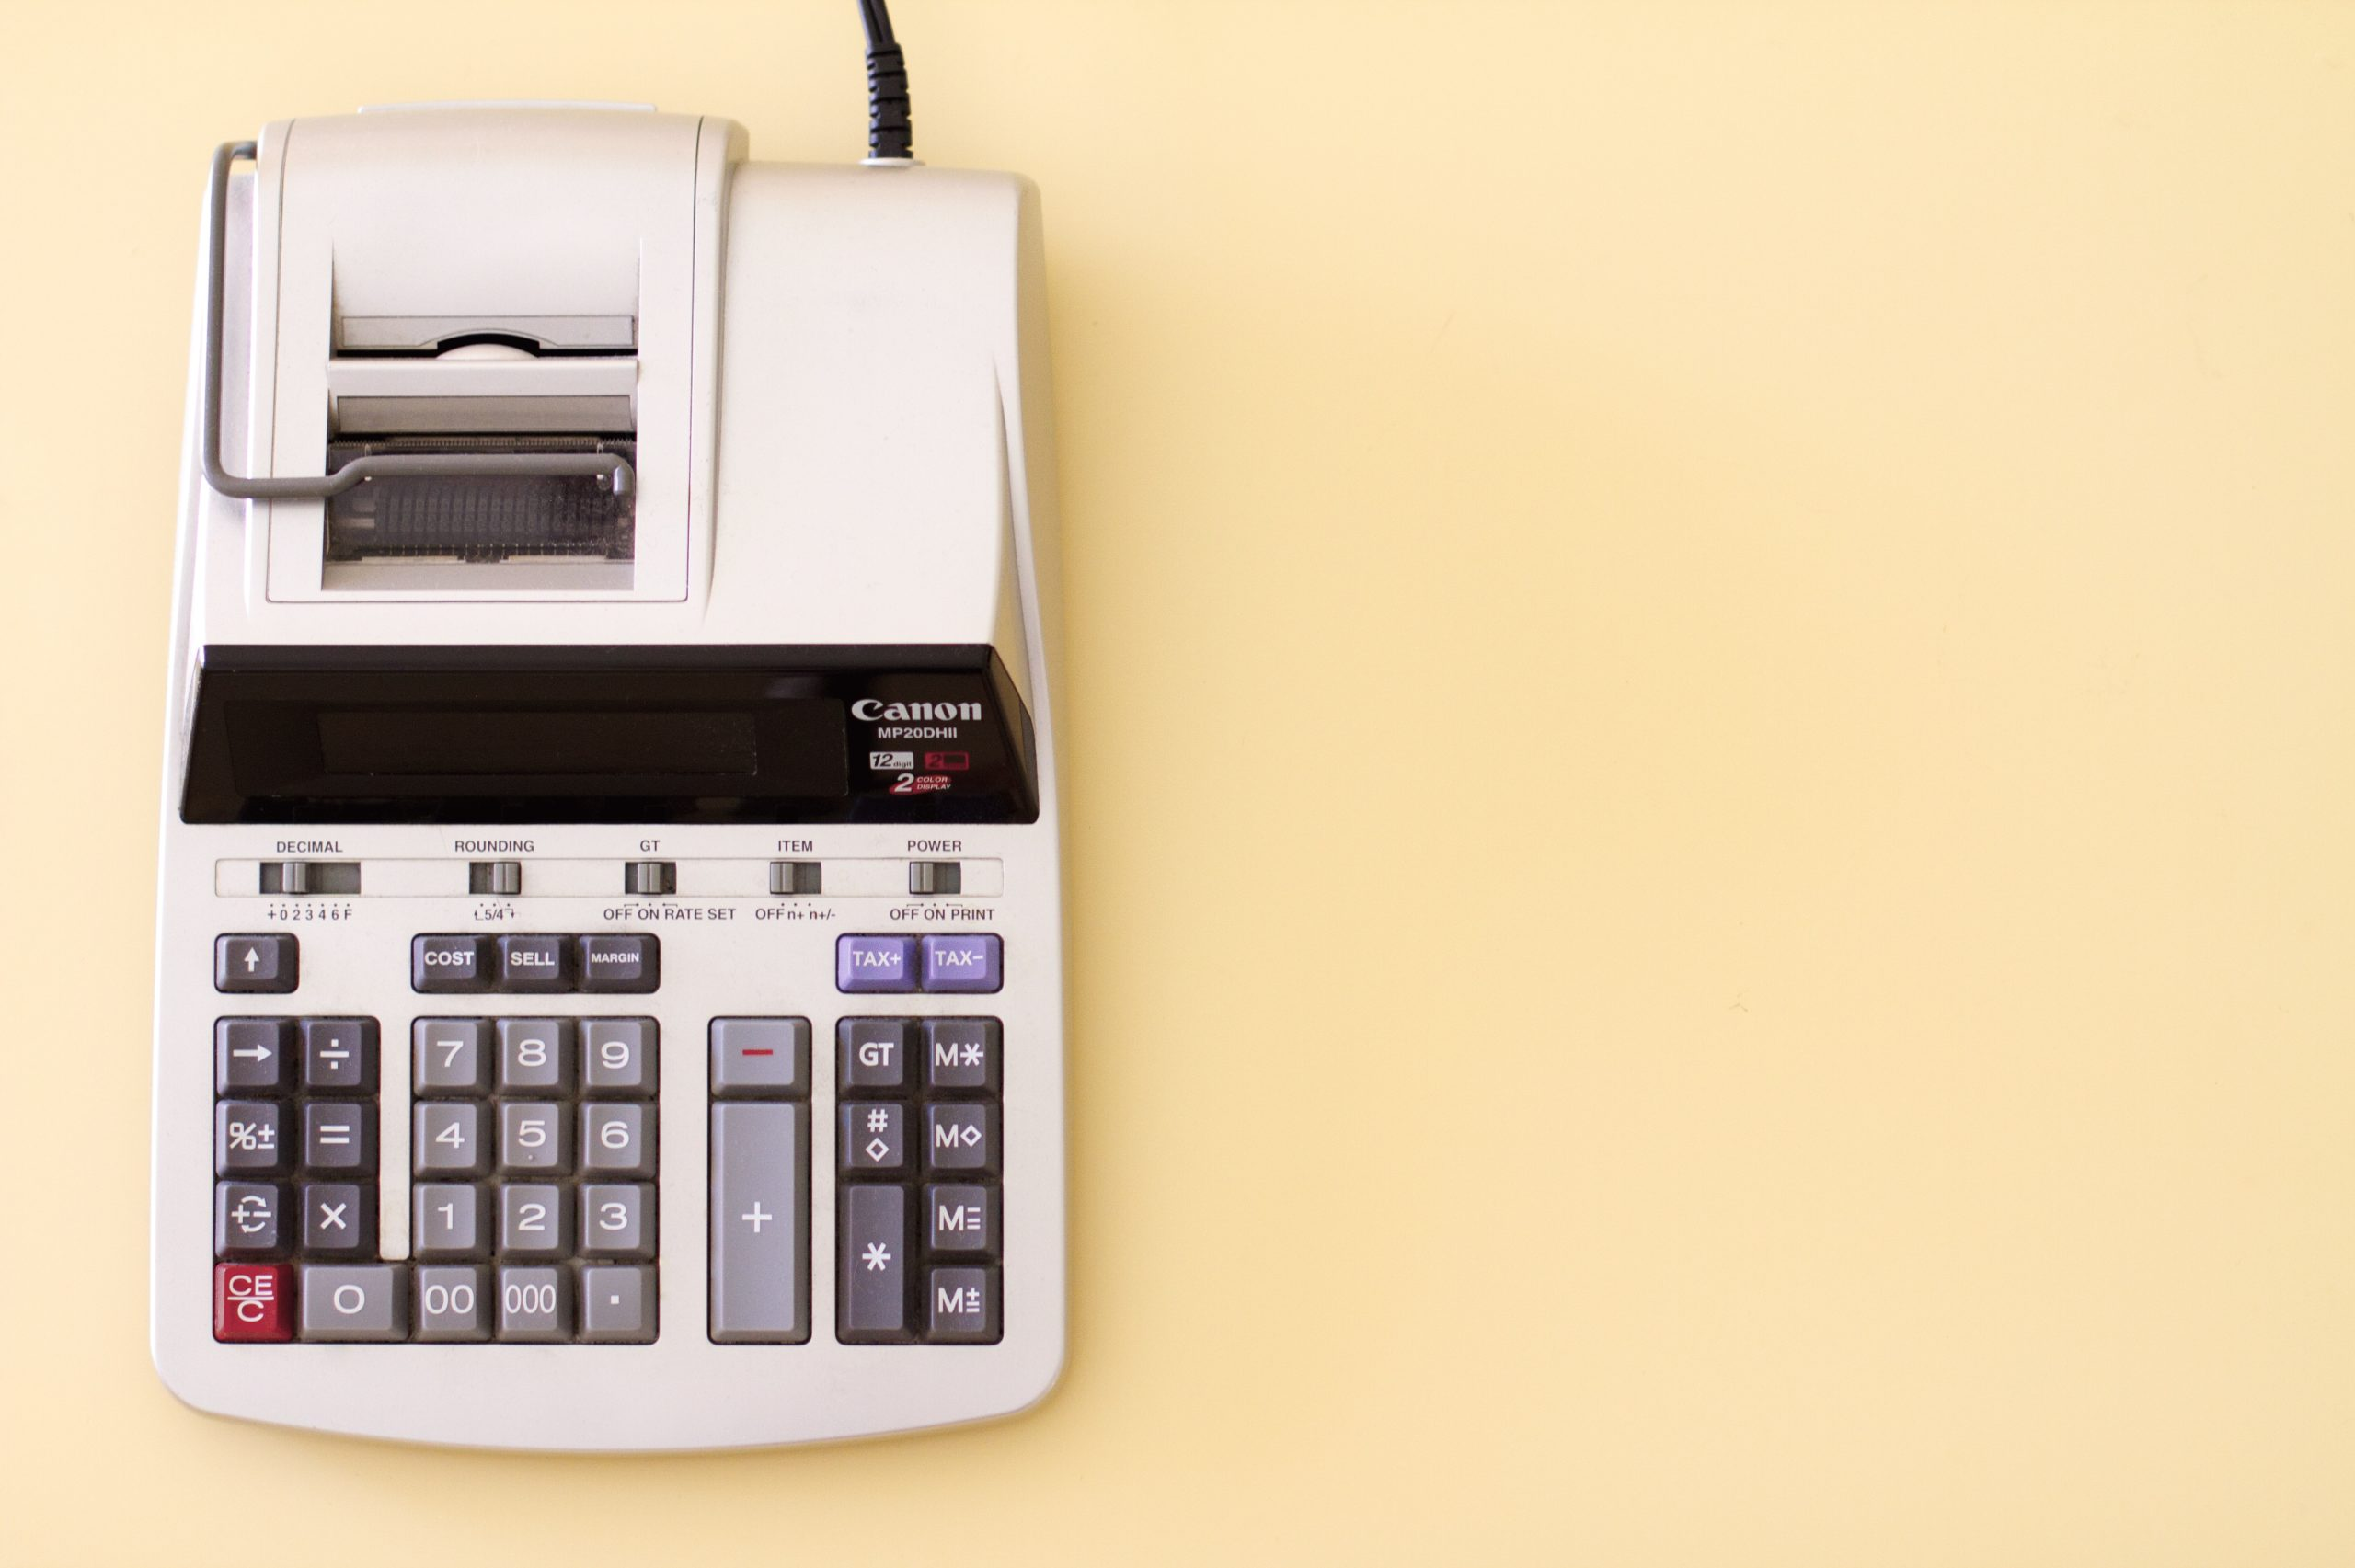 Inflation calculator UK